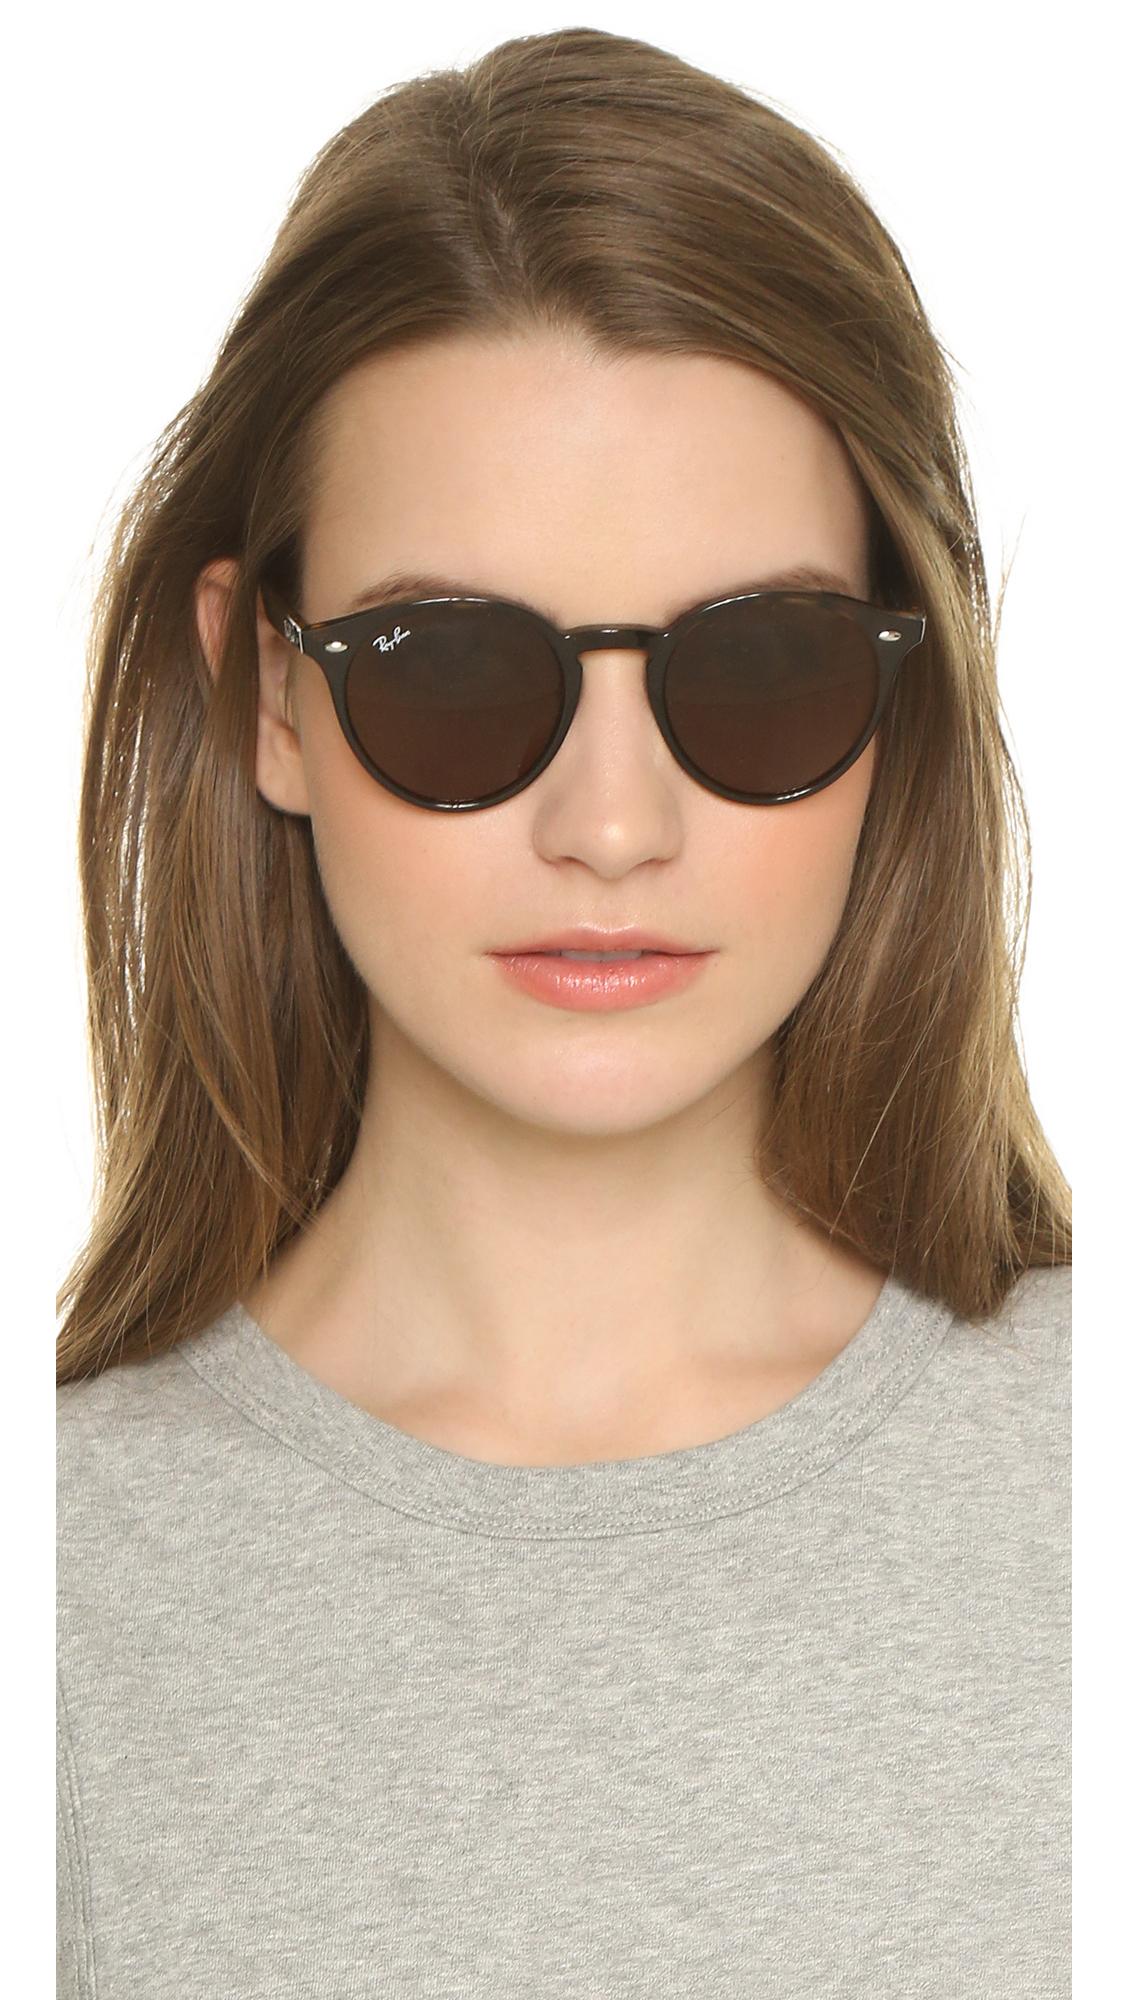 Ray Ban Highstreet Round Sunglasses Havana Dark Brown